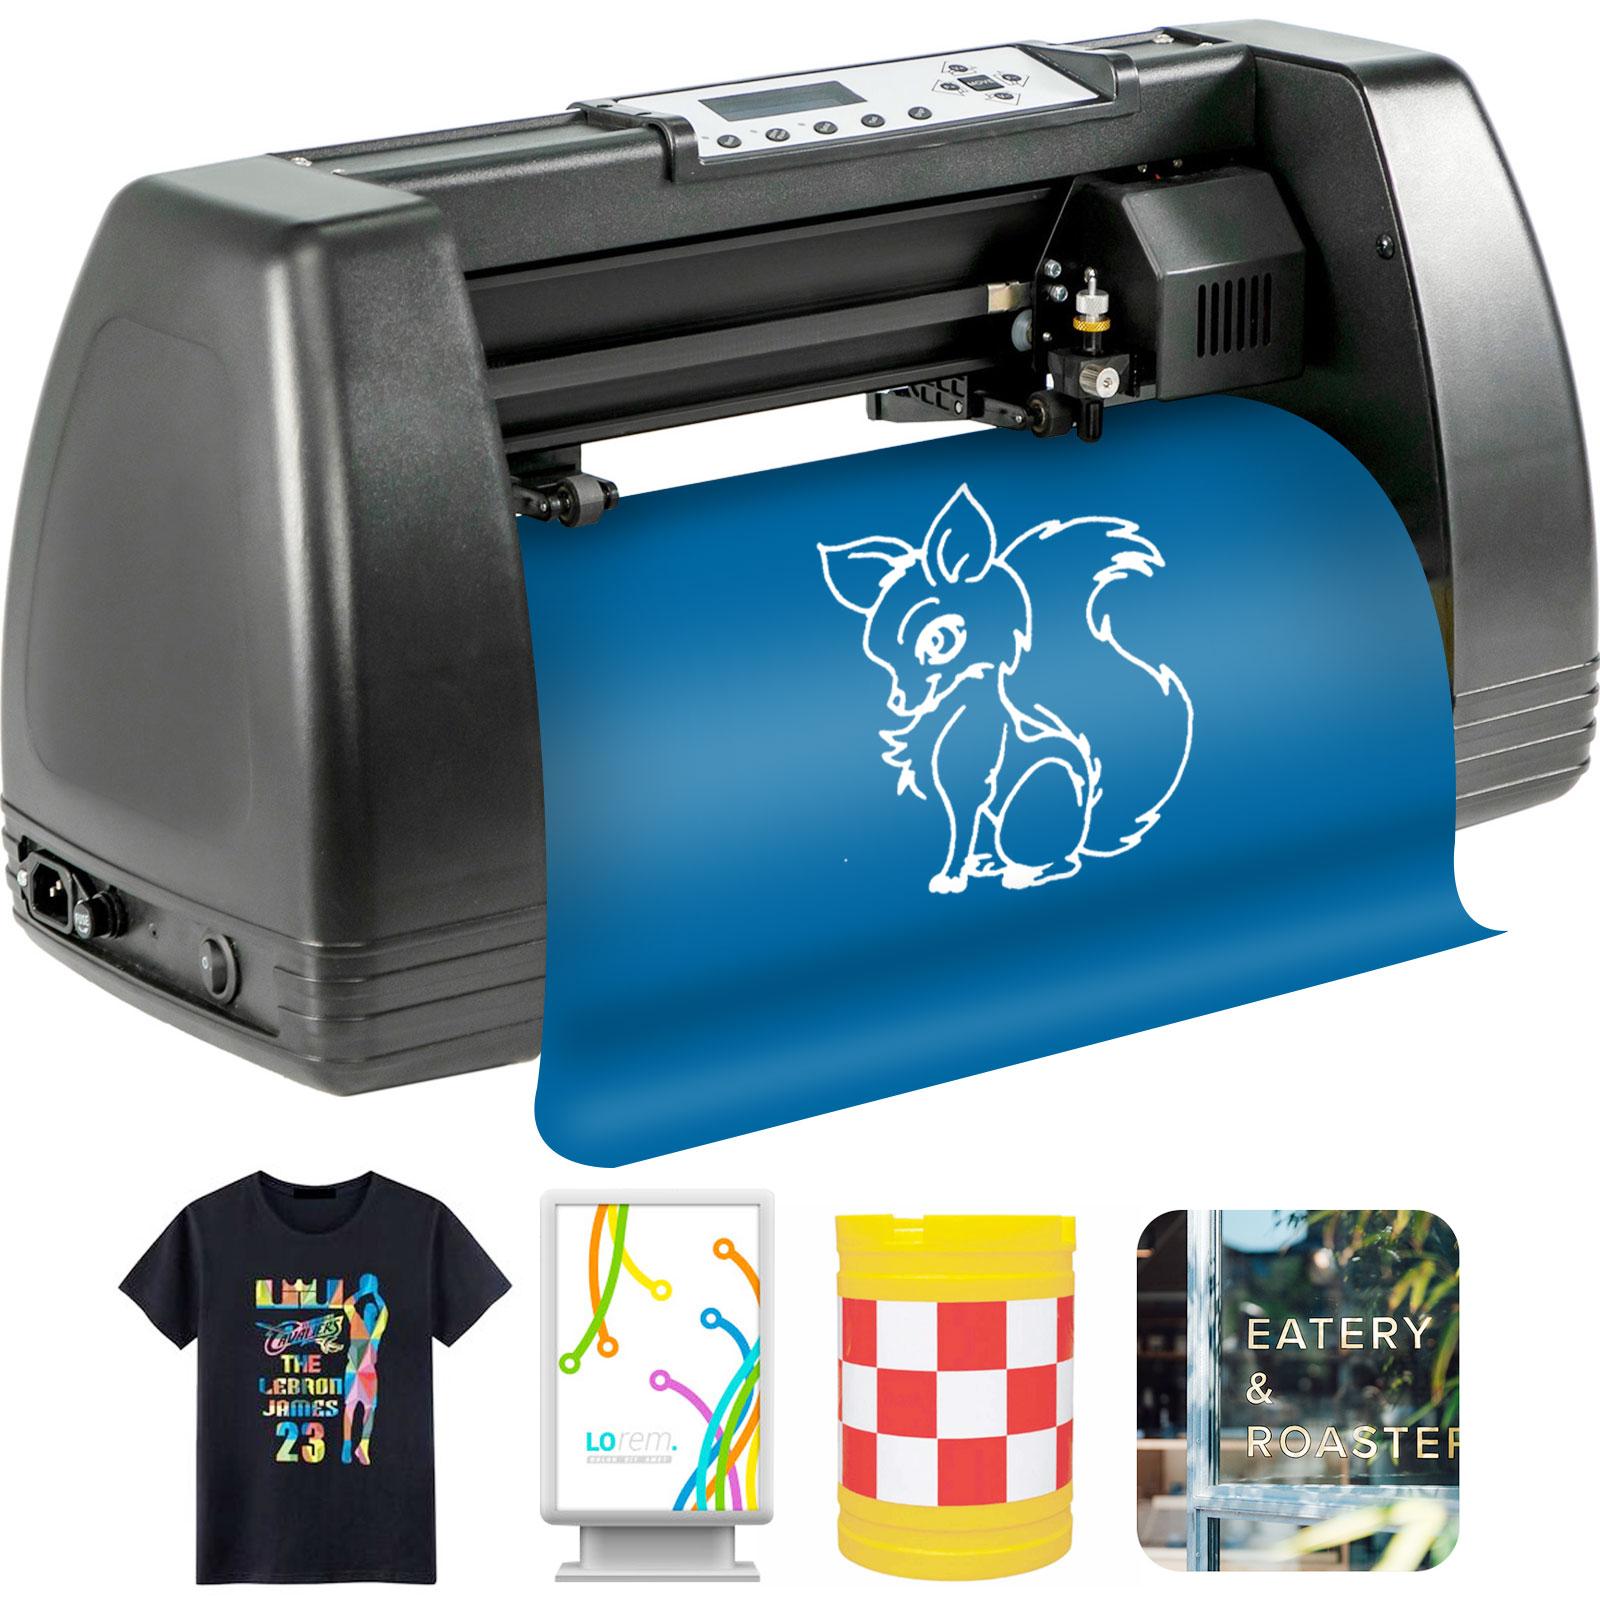 Schneideplotter Folienplotter Plottermaschine LCD Bildschirm Dekoration Print